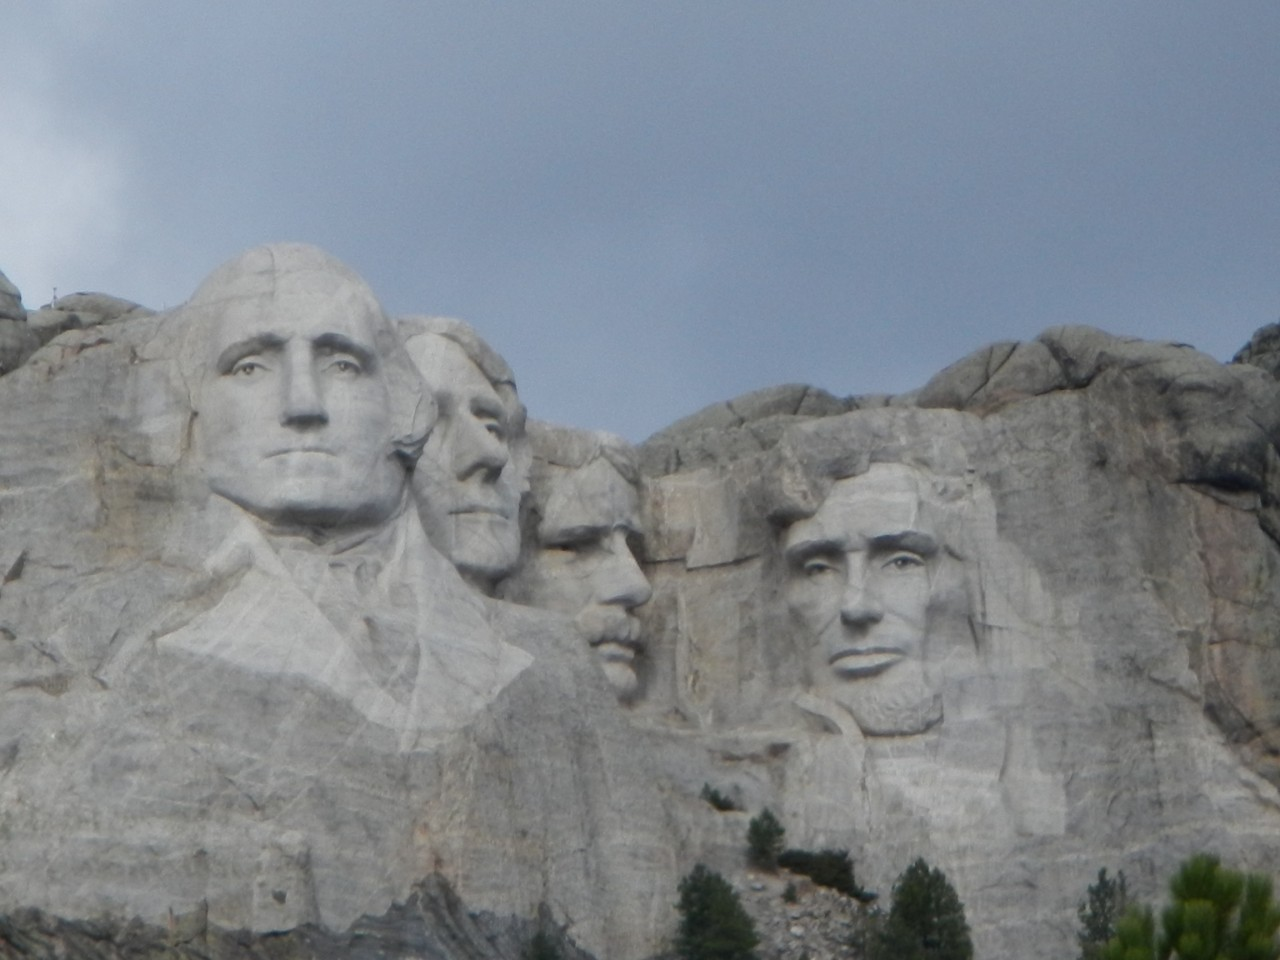 Mount Rushmore in Dakota